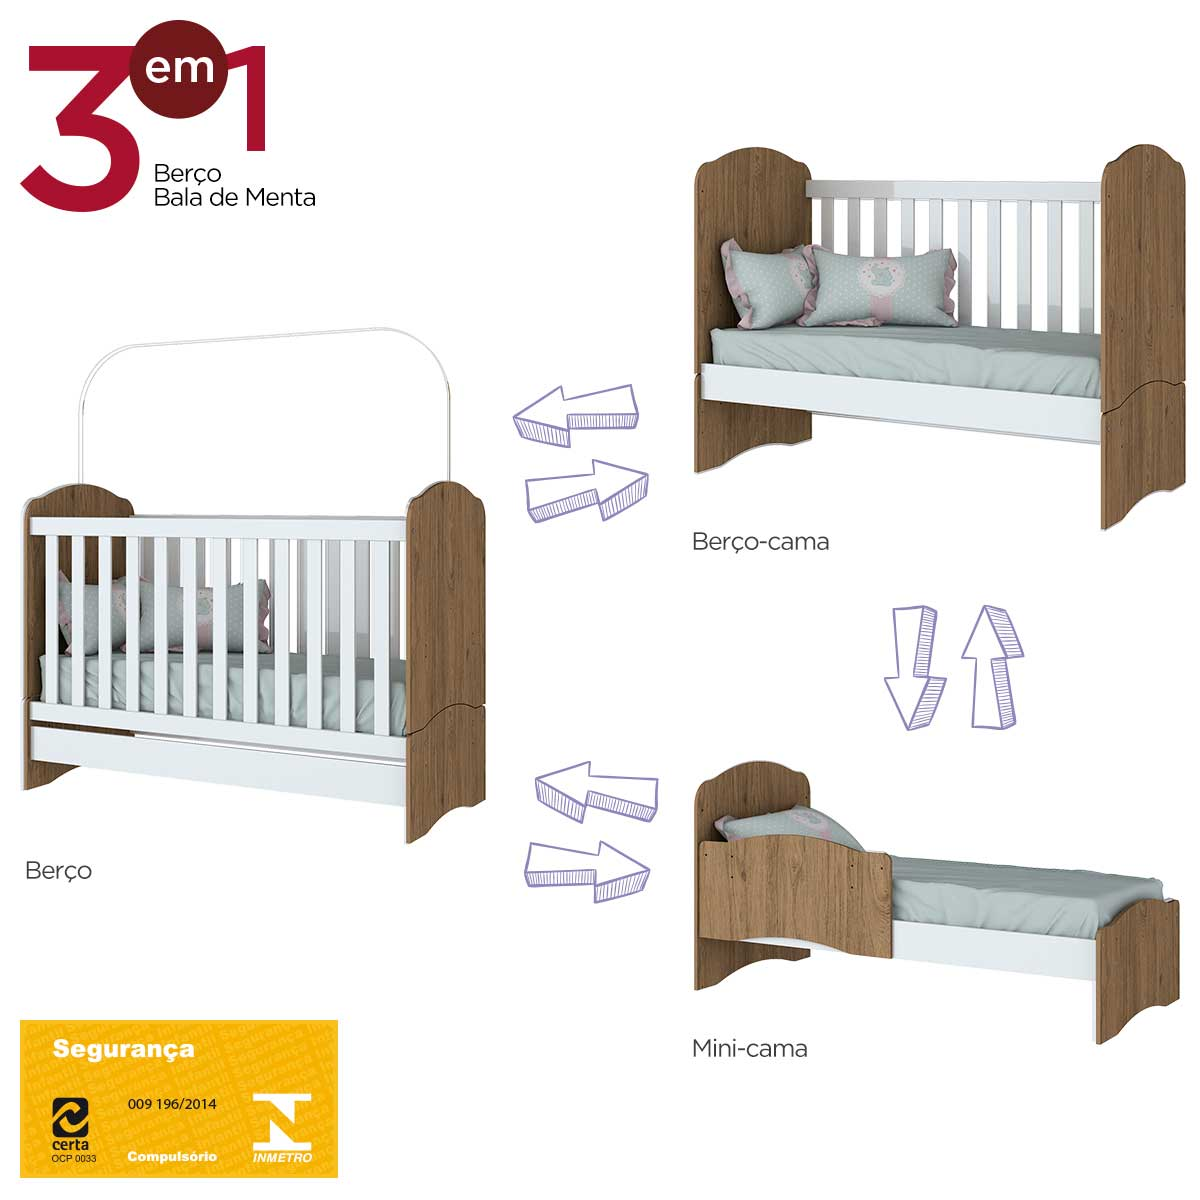 Quarto de Bebê Completo com Berço, Cômoda e Guarda-roupa Henn Bala de Menta - Rústico/Branco  - Loja Veneza